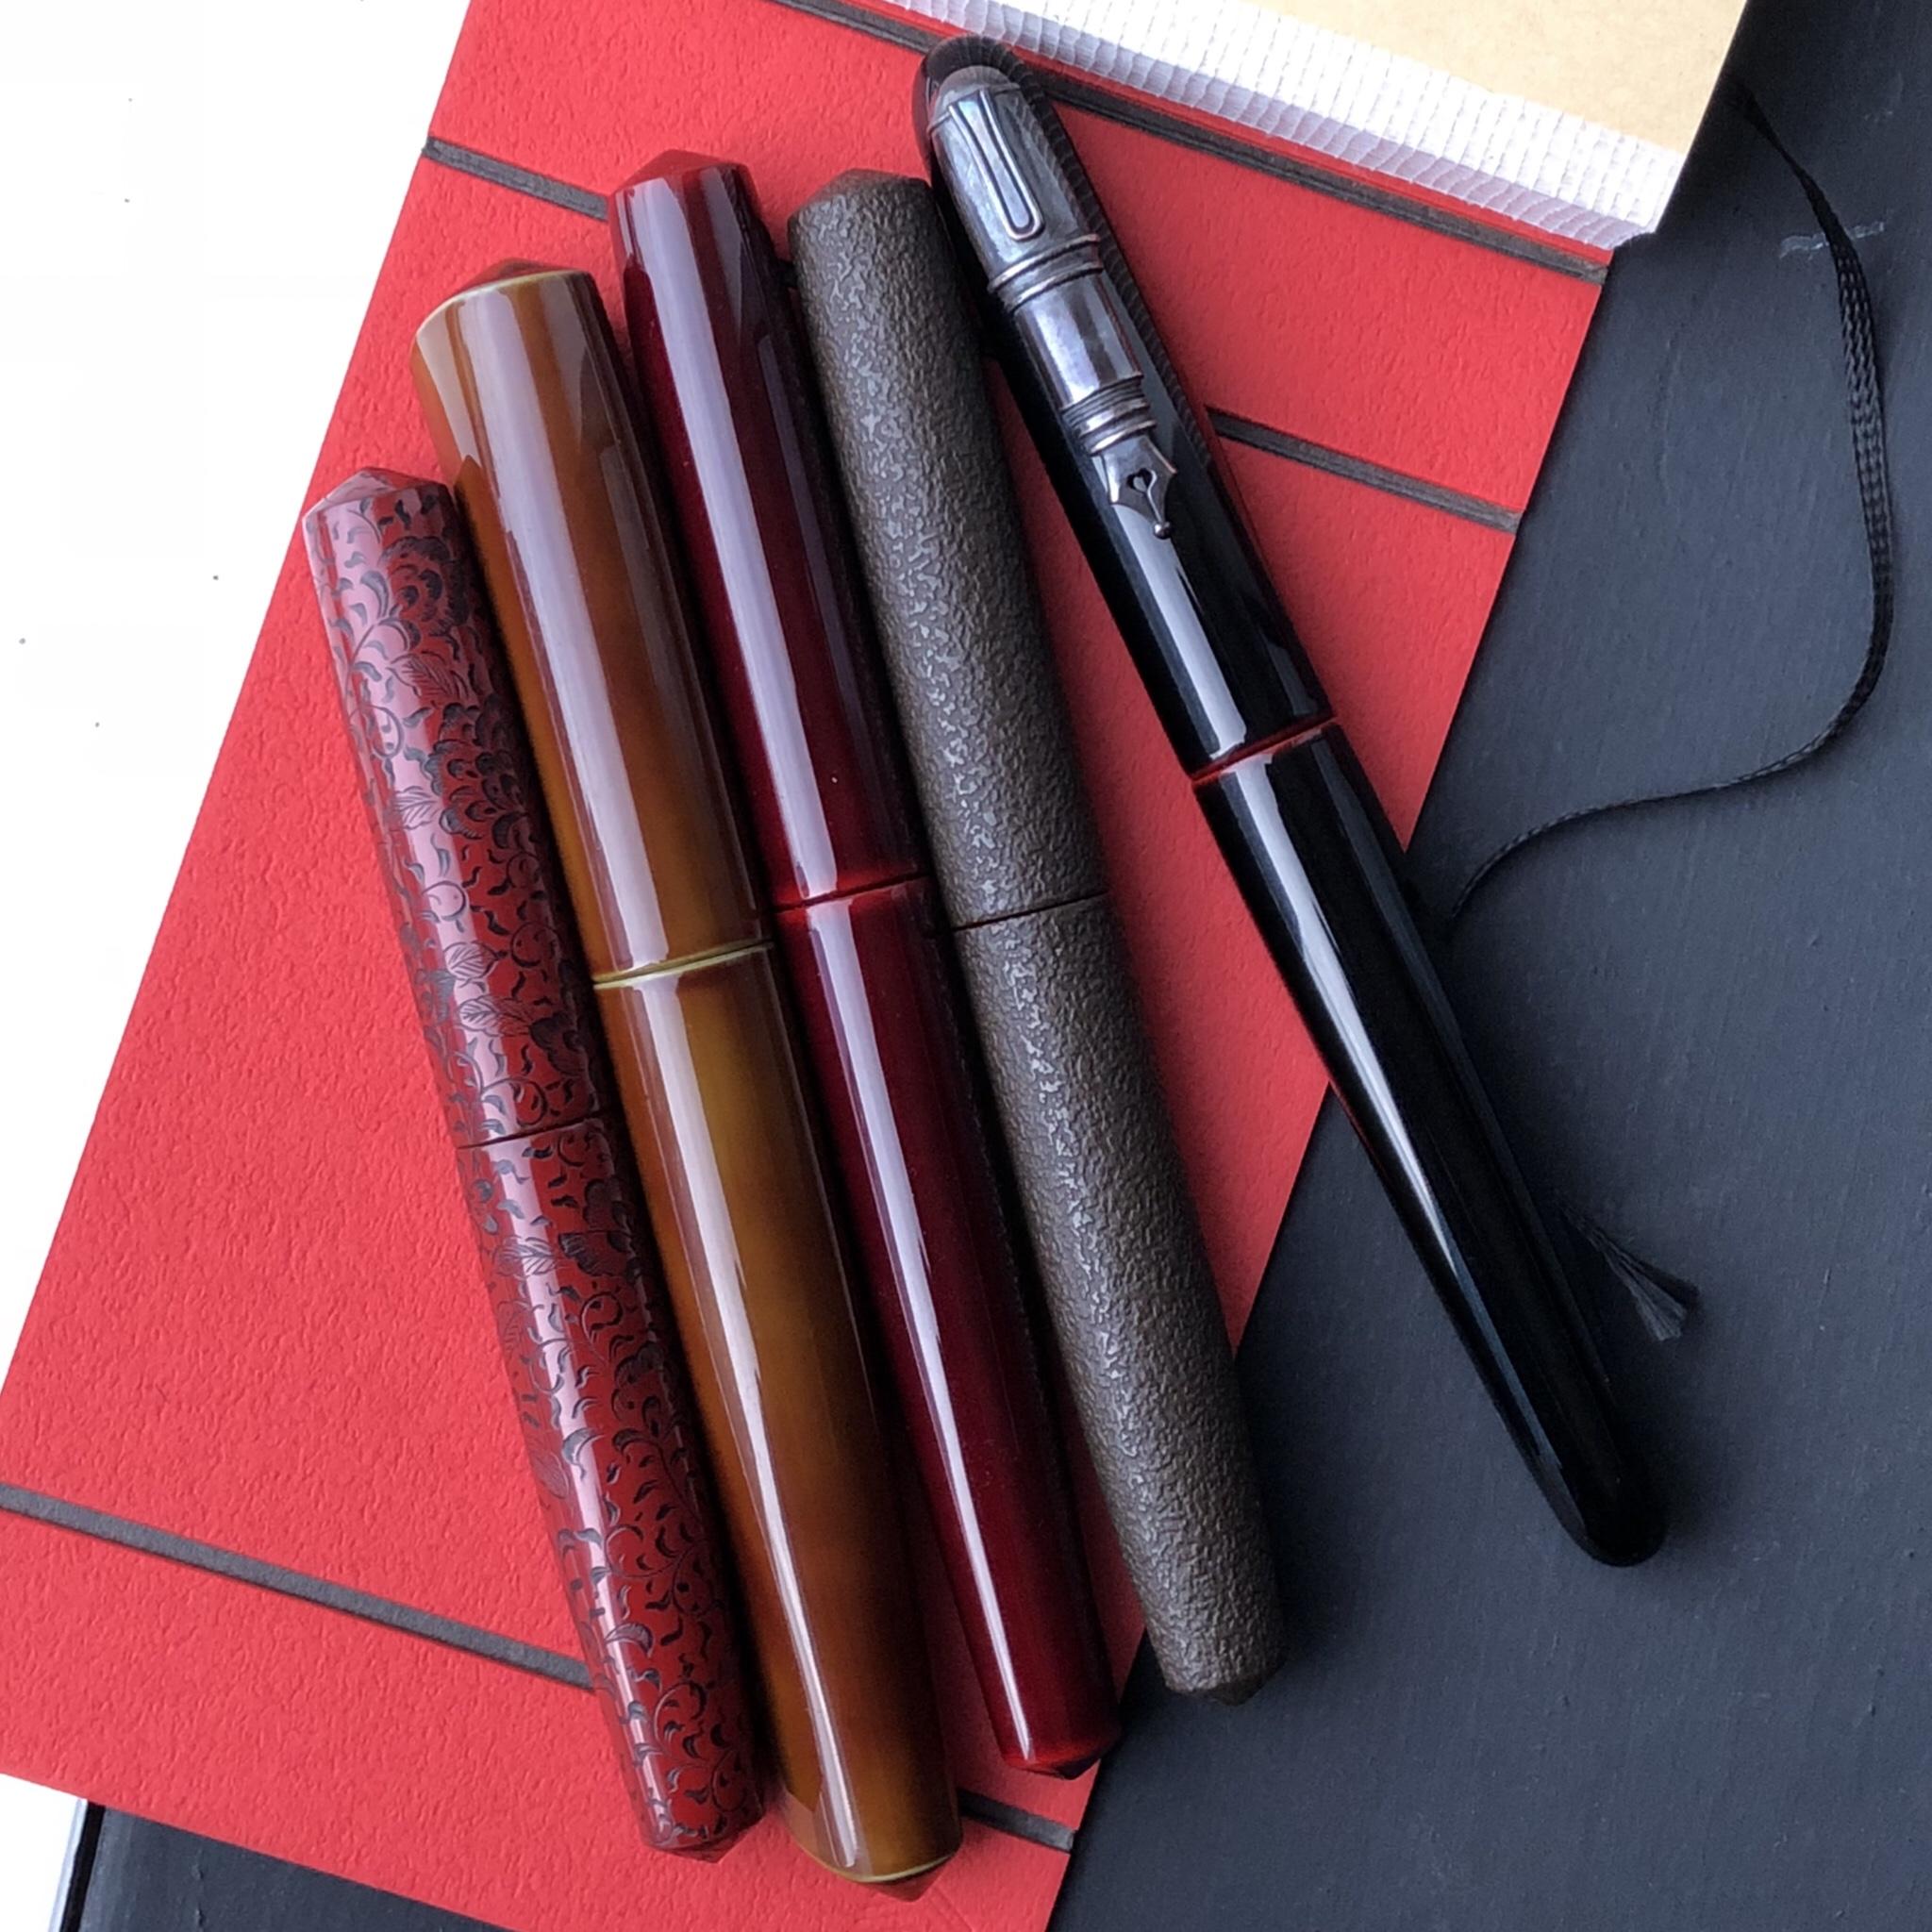 Five Nakaya pens